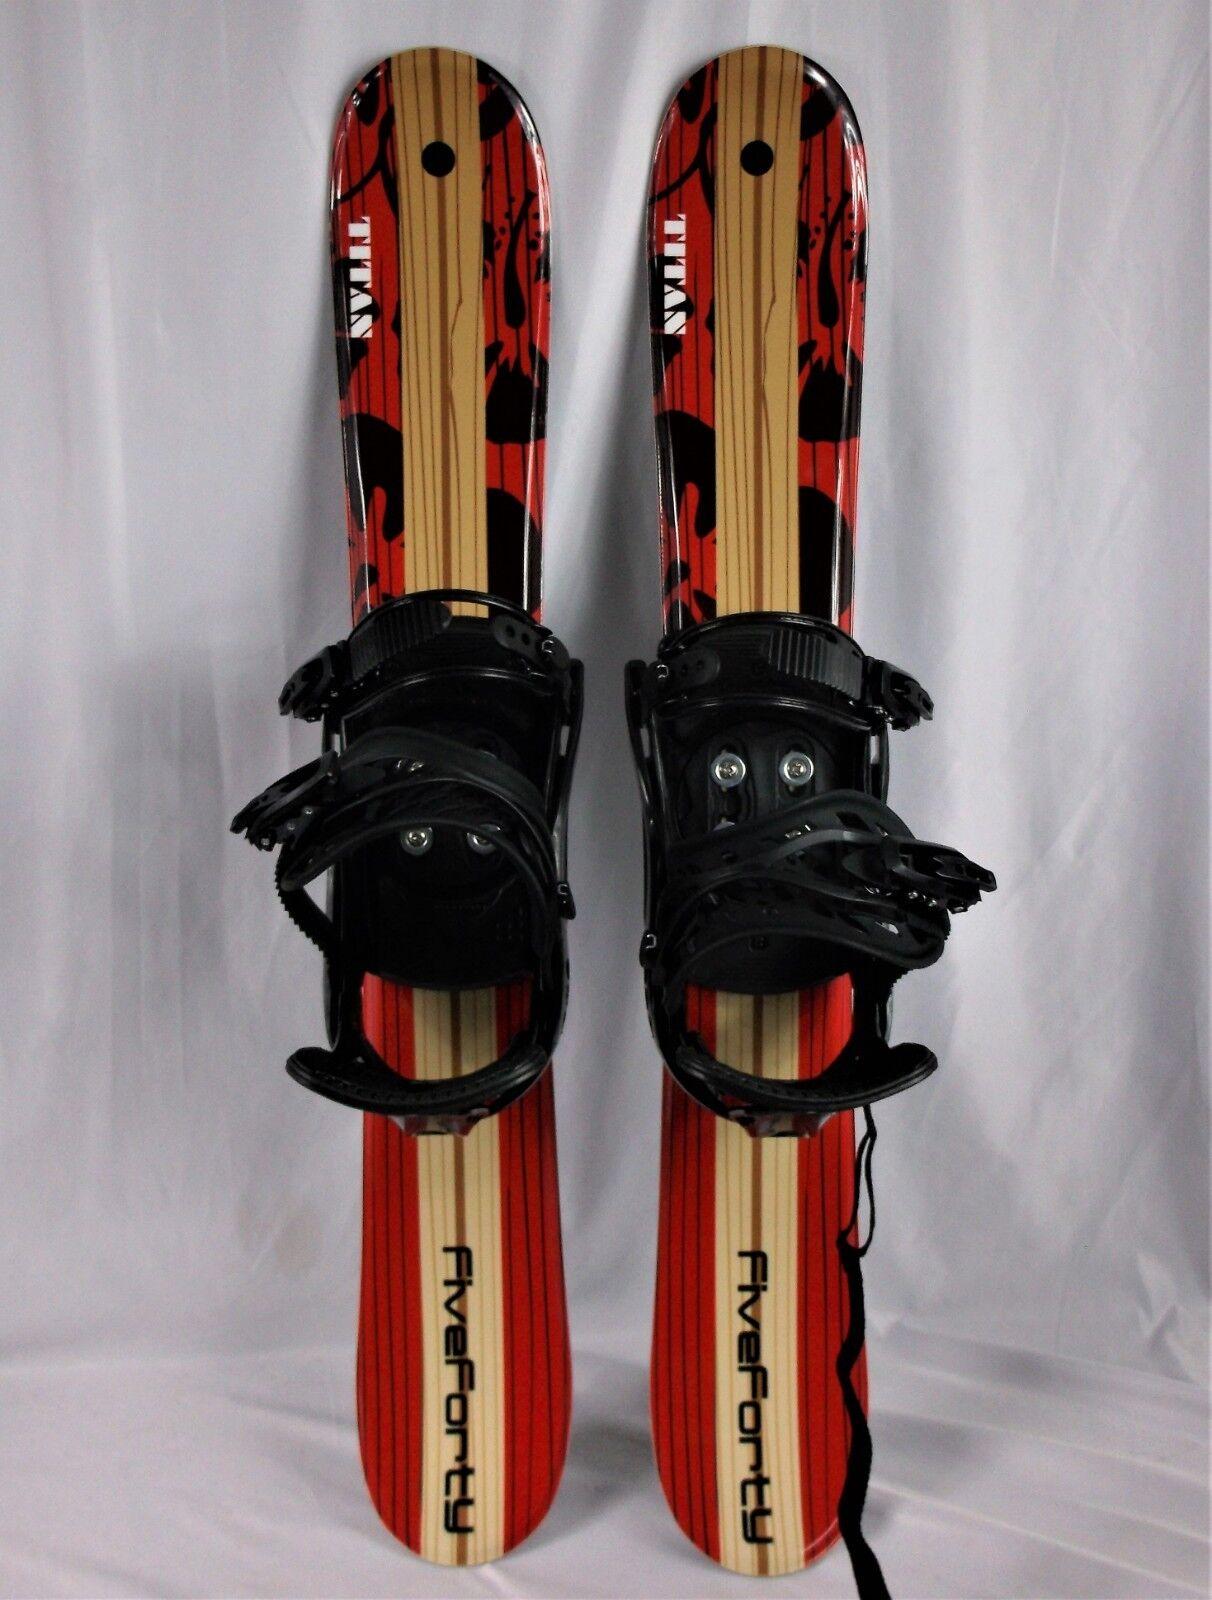 Snowblades, 90cm FiveForty Titan, Wide Ski Blades, FiveForty snowboard bindings